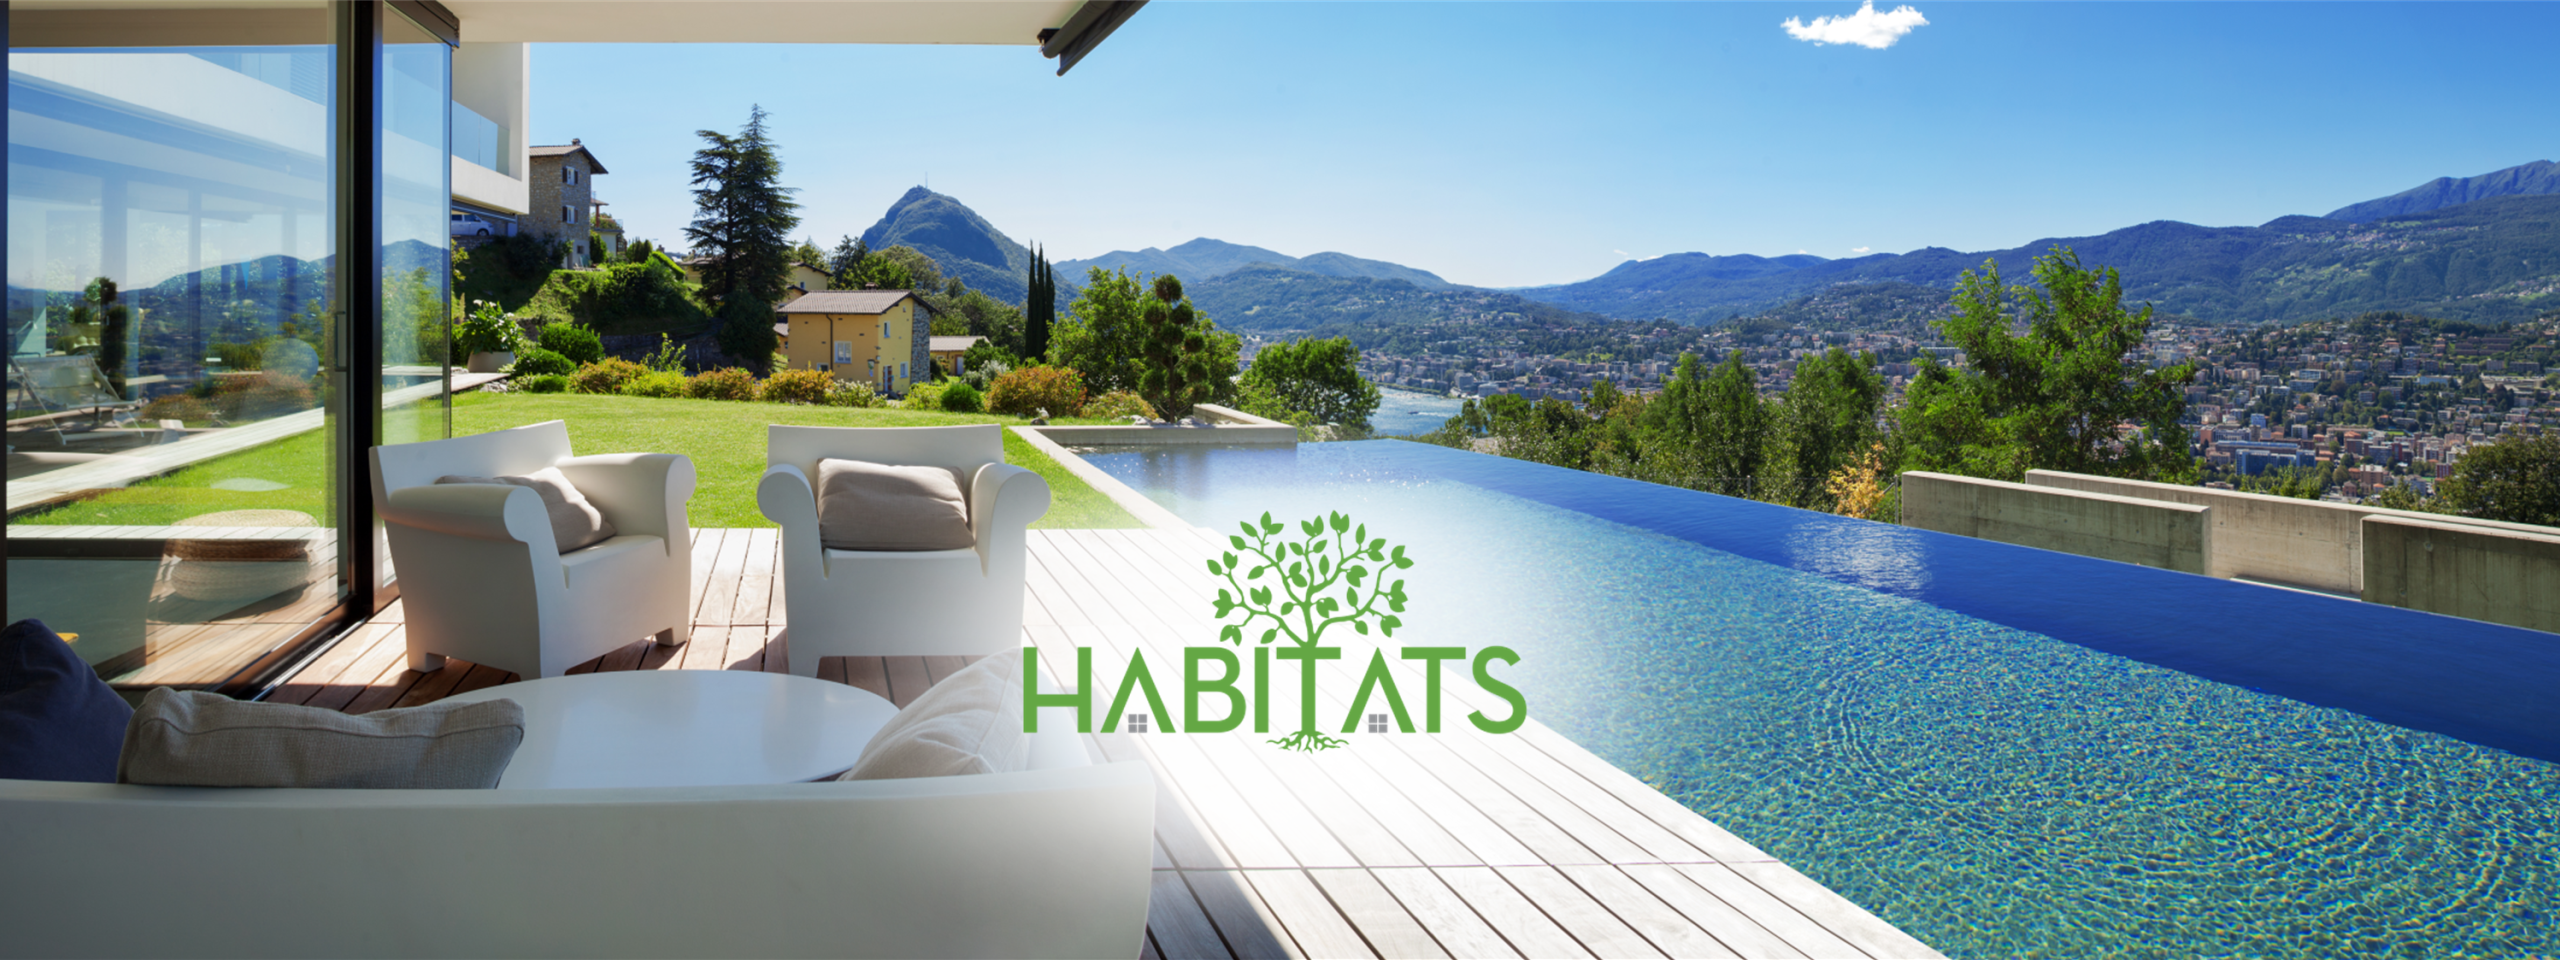 Distinctive Homes for Discerning Clientele